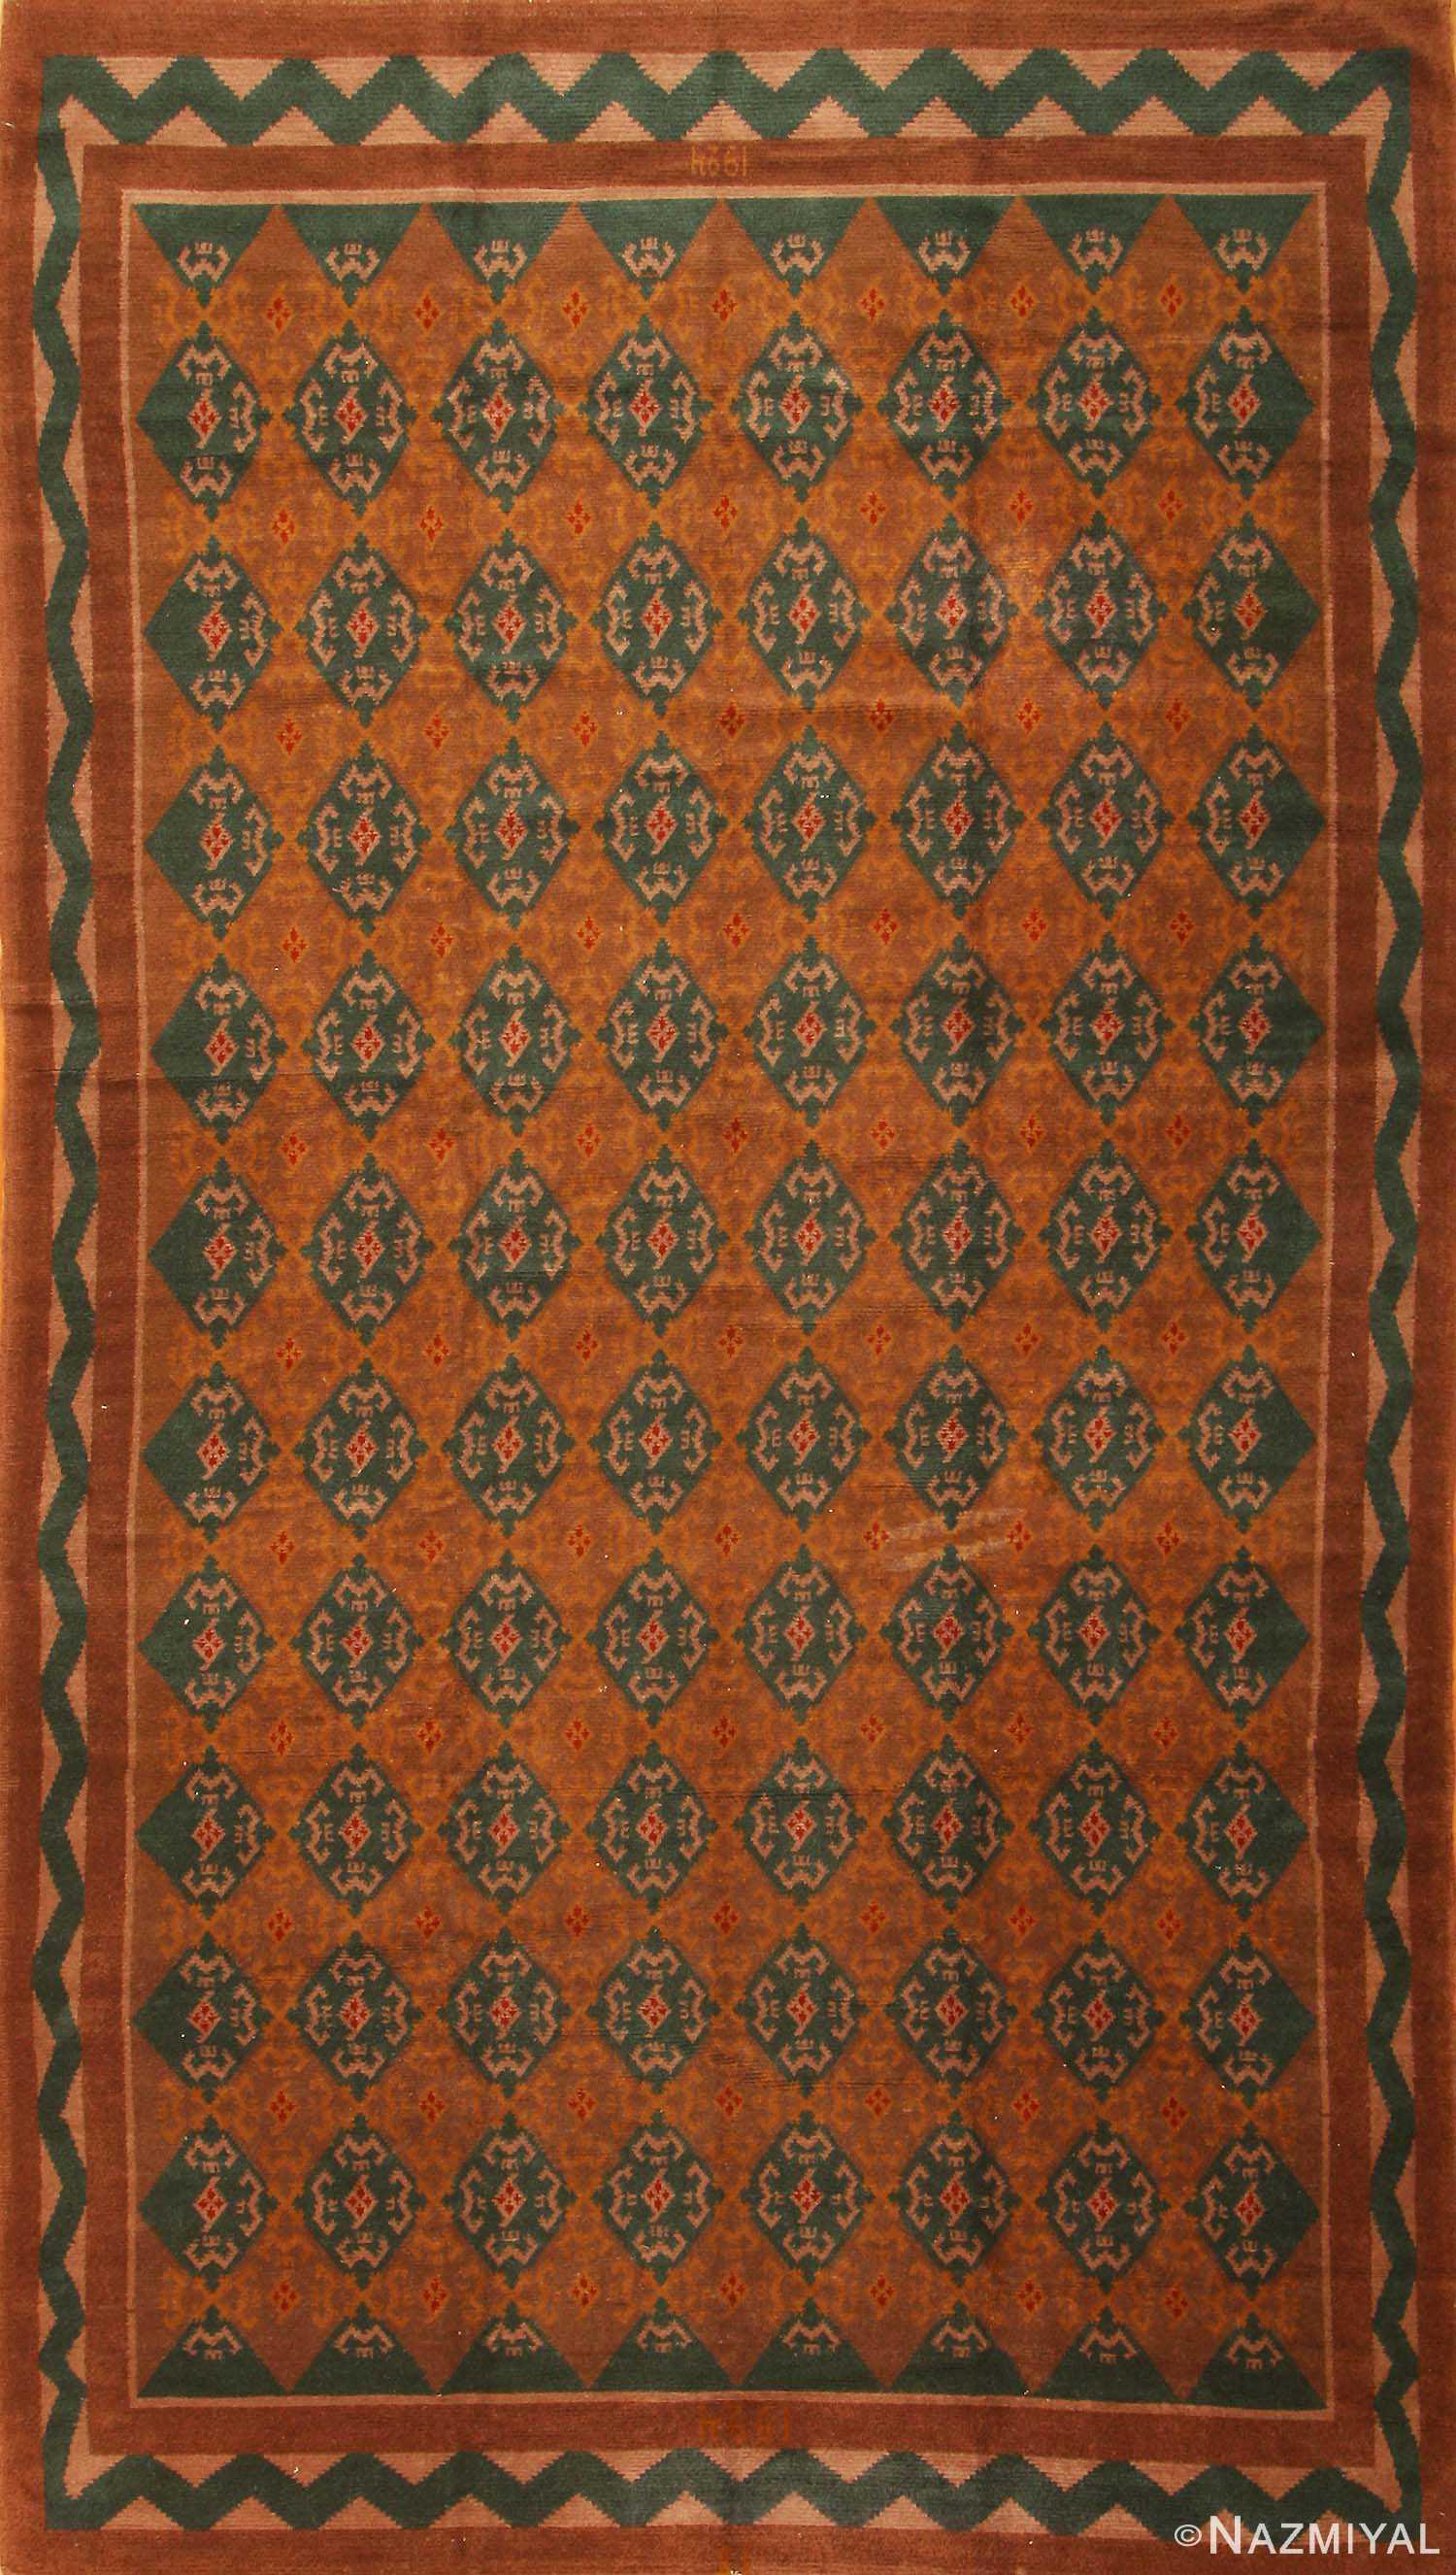 Art Deco Scandinavian Swedish Carpet 3367 Nazmiyal